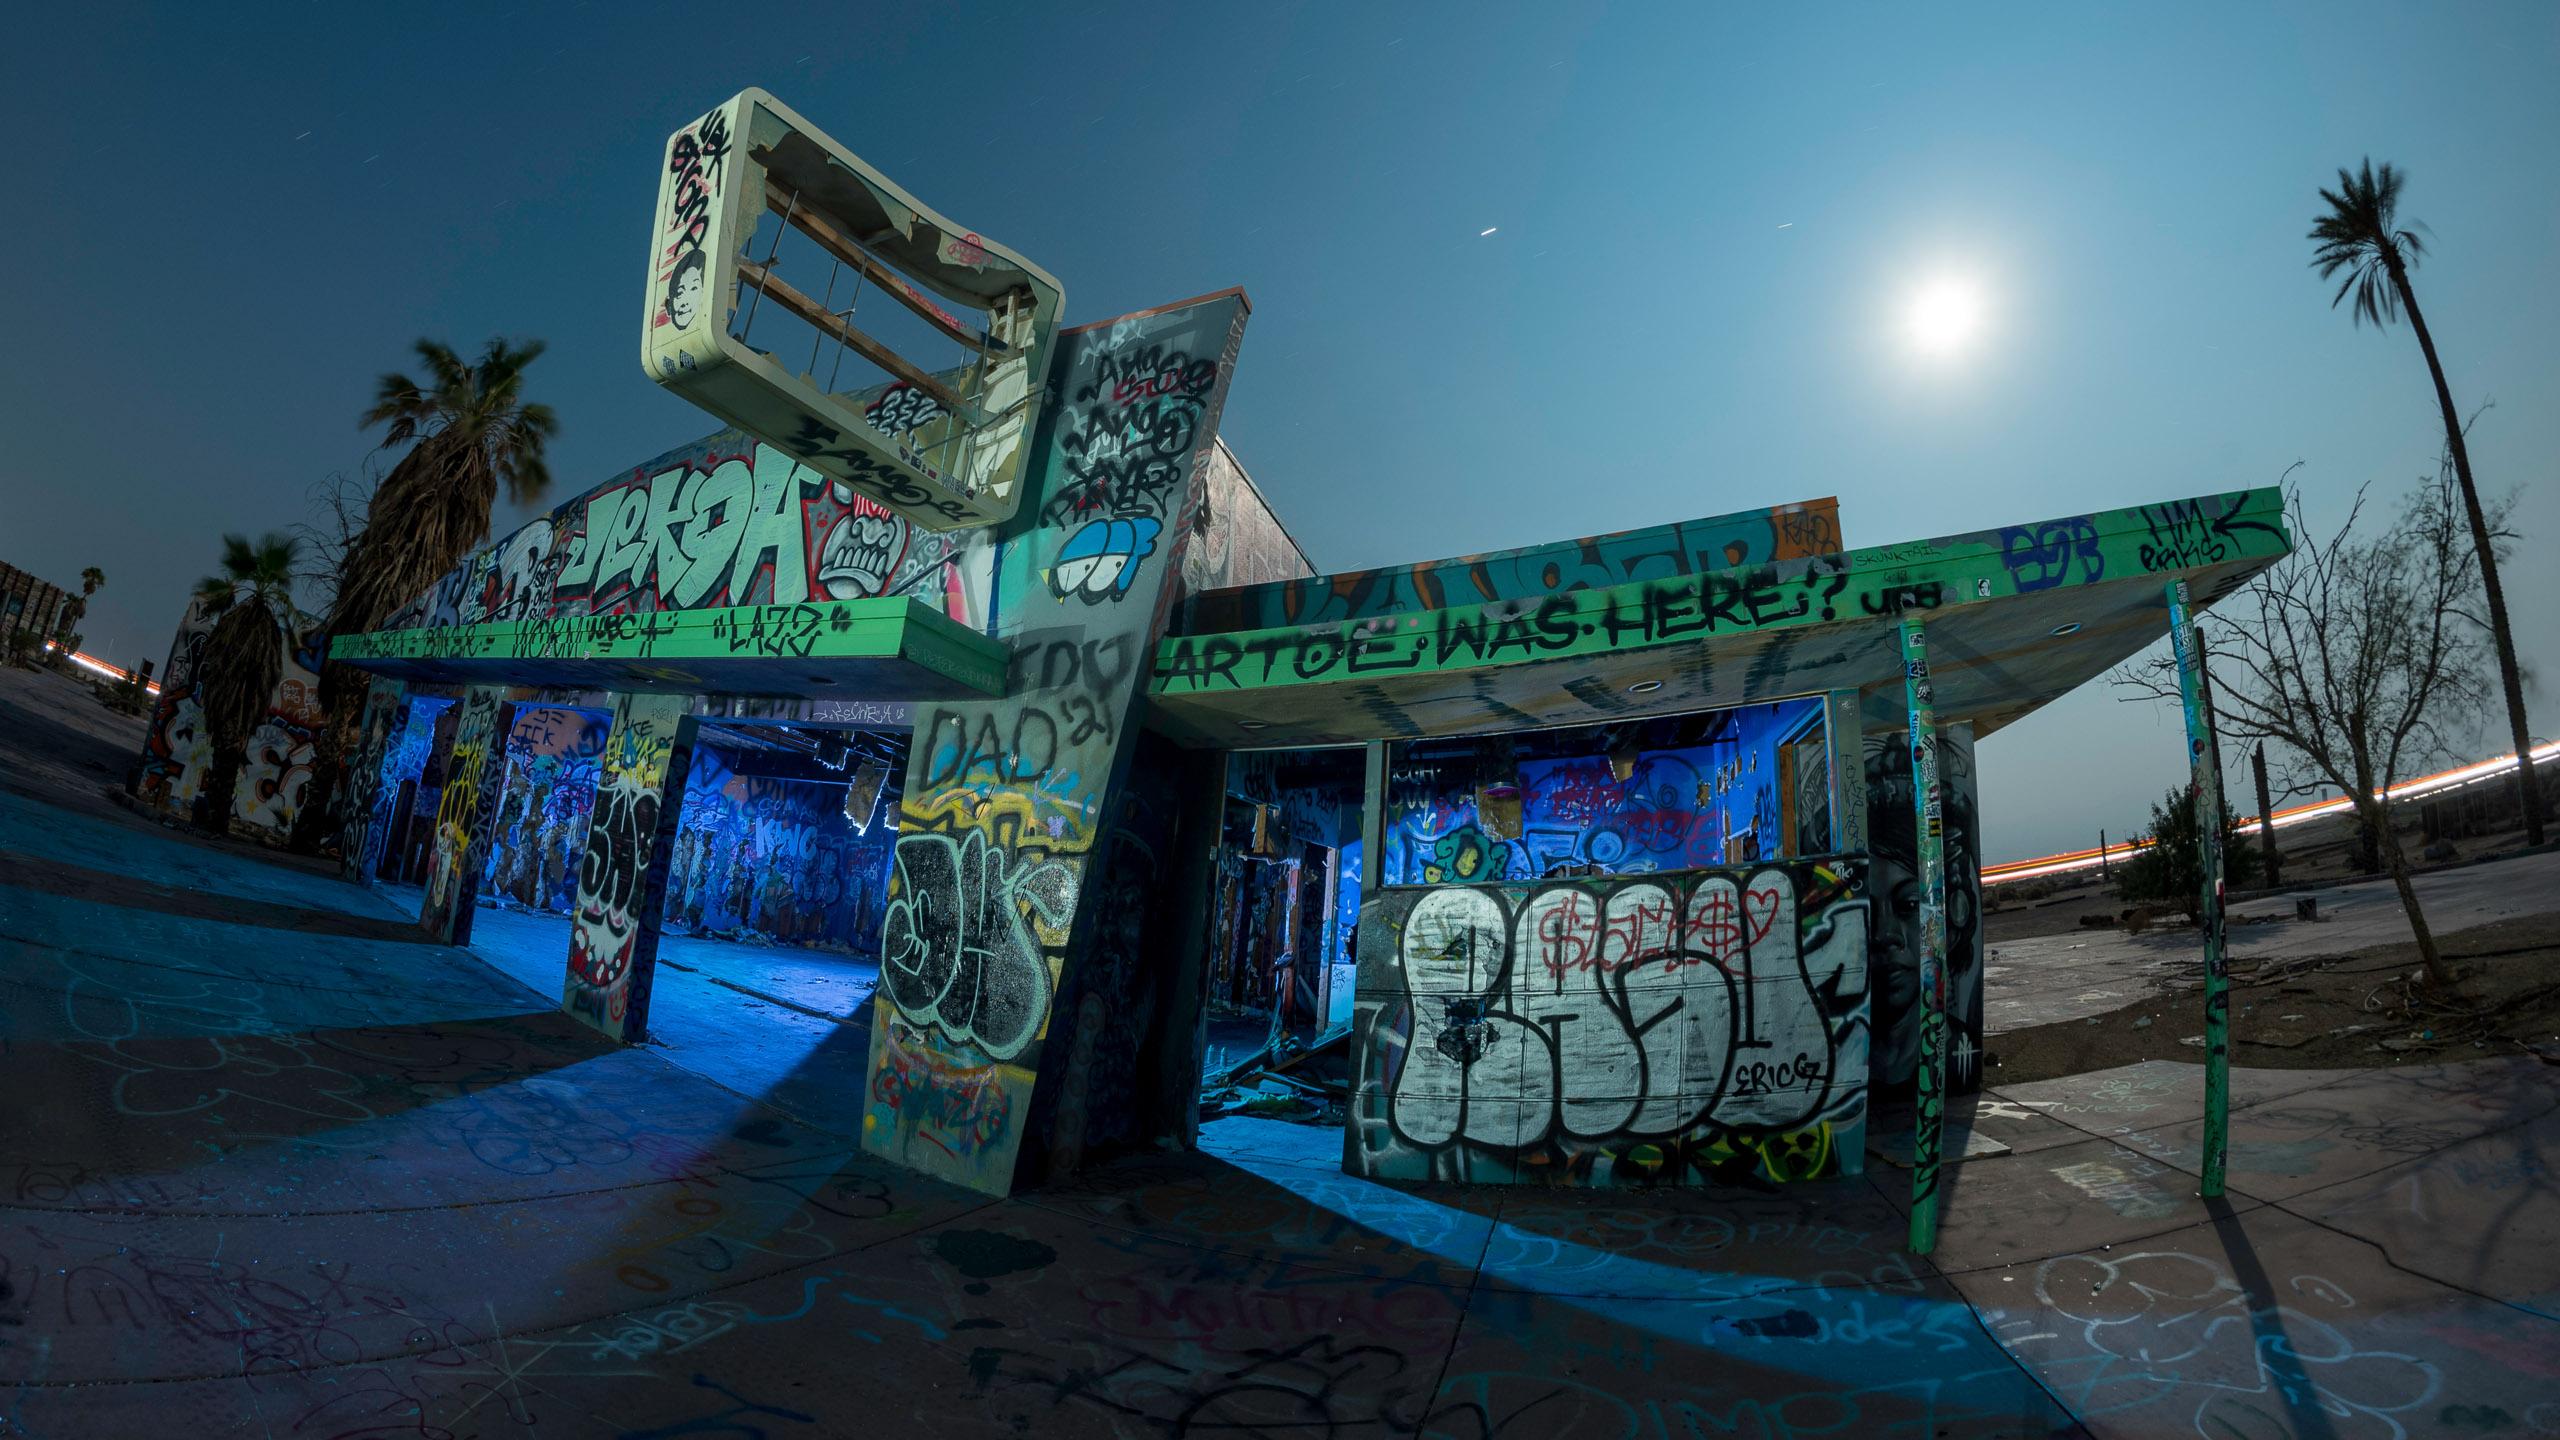 9619_kenlee_lake-dolores-waterpark_210820_0010_210sf8iso200_D750_arcade-building-blue-interior-fisheye-2560X1440PX-HEADER-PHOTOFOCUS_1600px-photofocus-sharpening